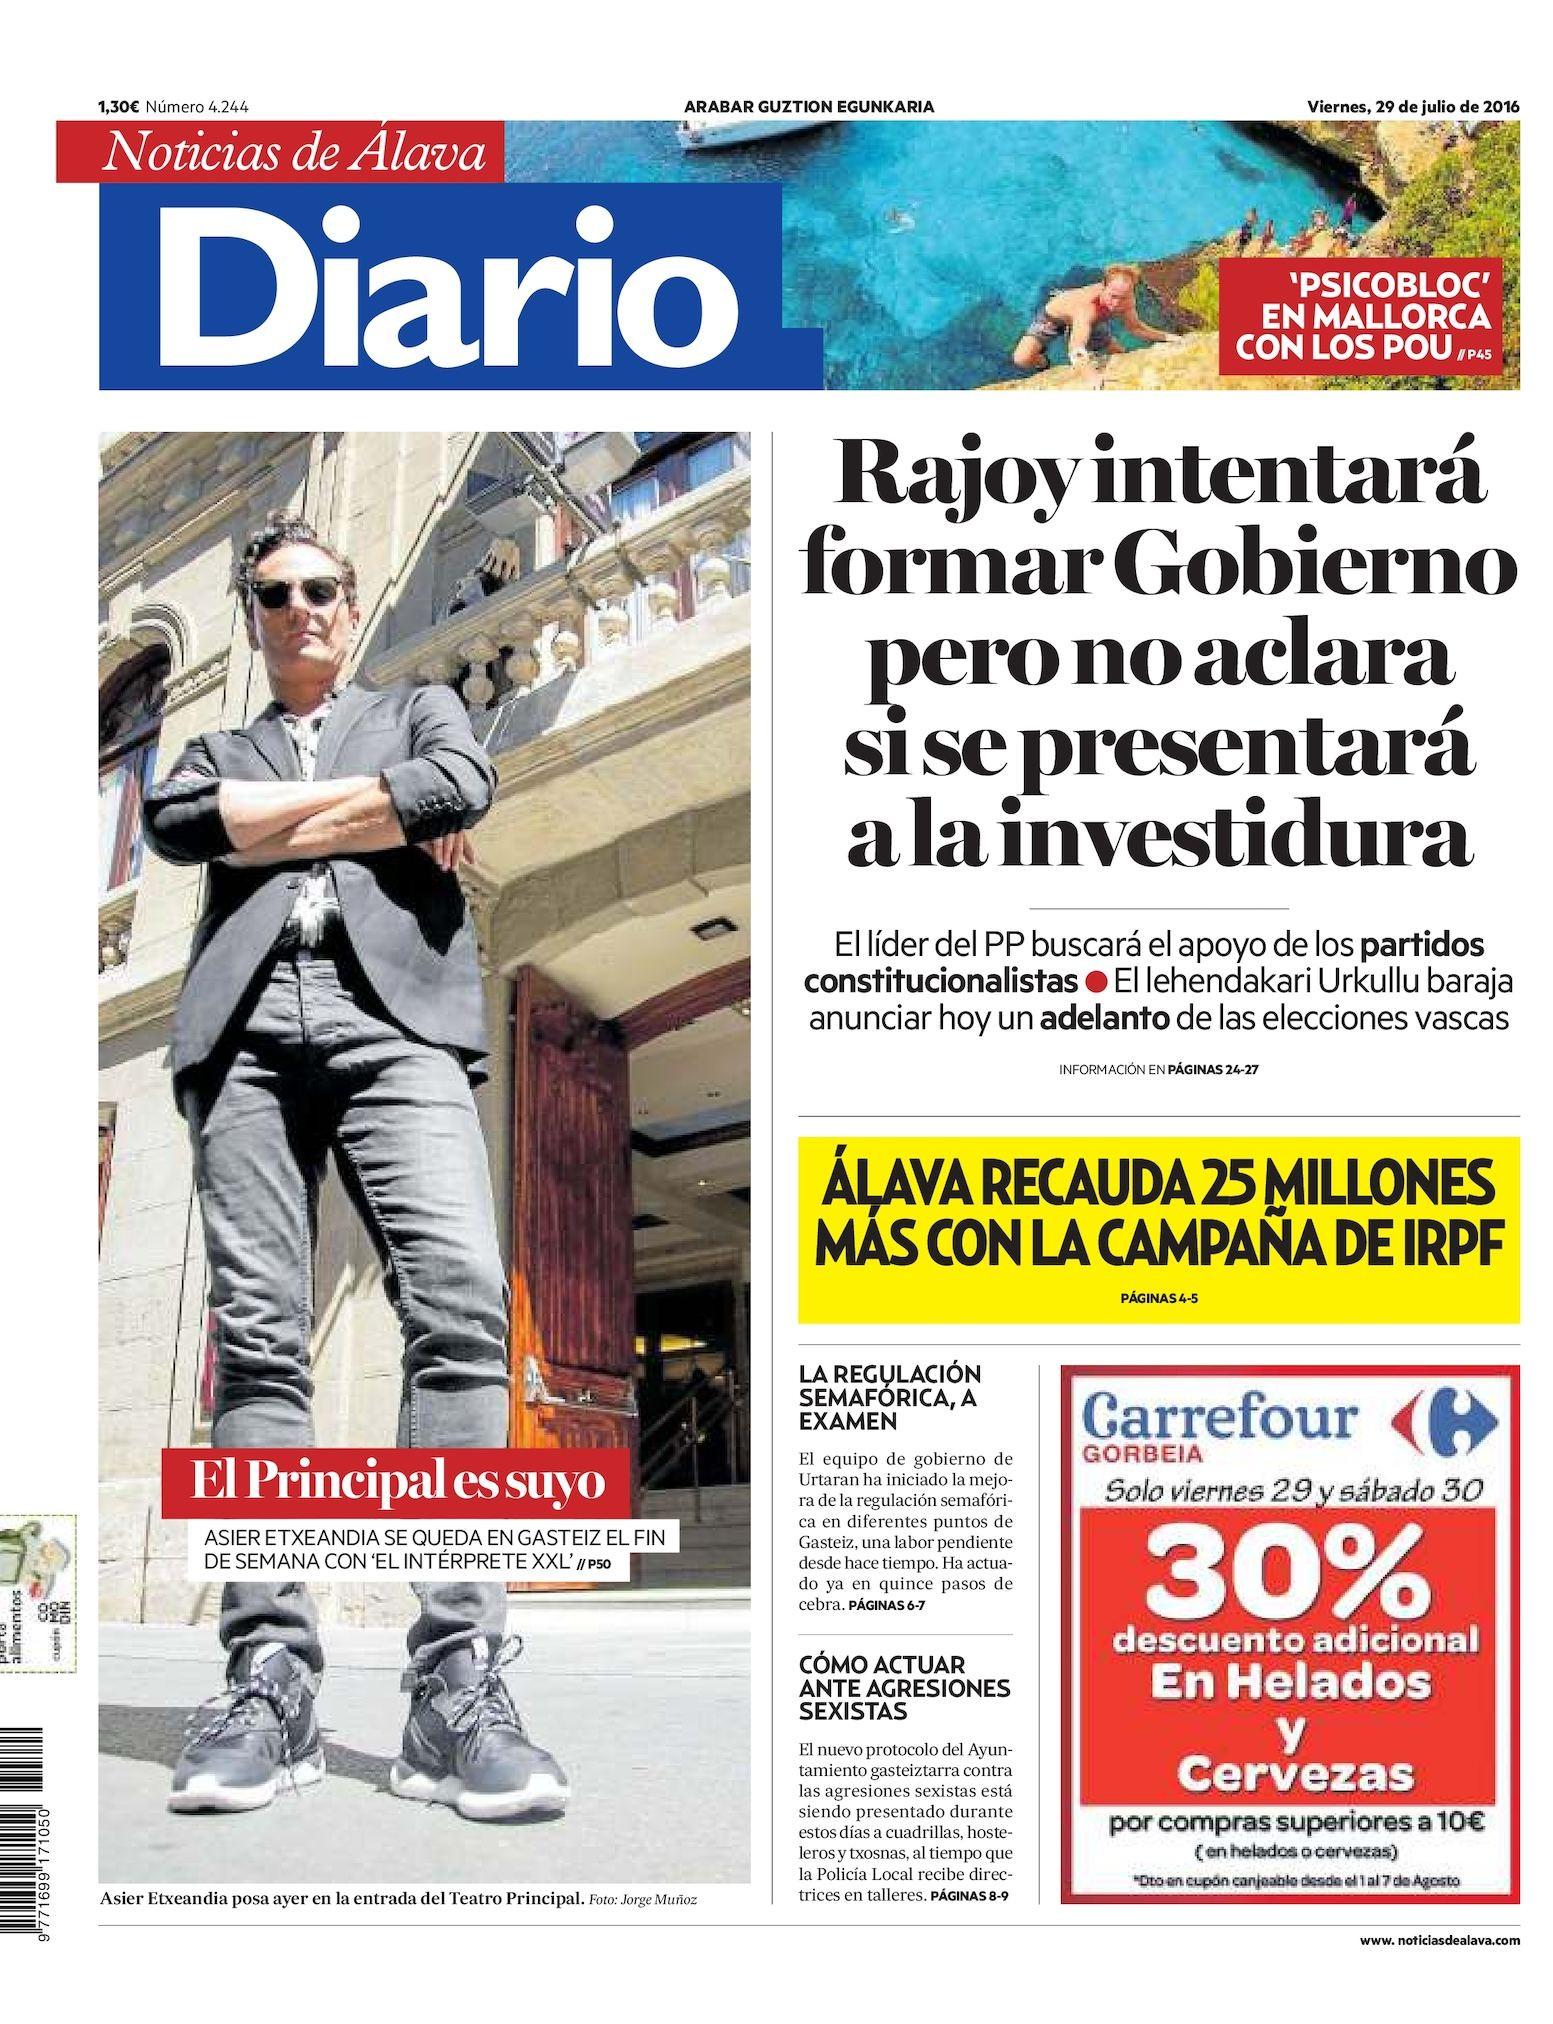 Calendario Laboral Bizkaia 2019 Boe Más Caliente Calaméo Diario De Noticias De lava